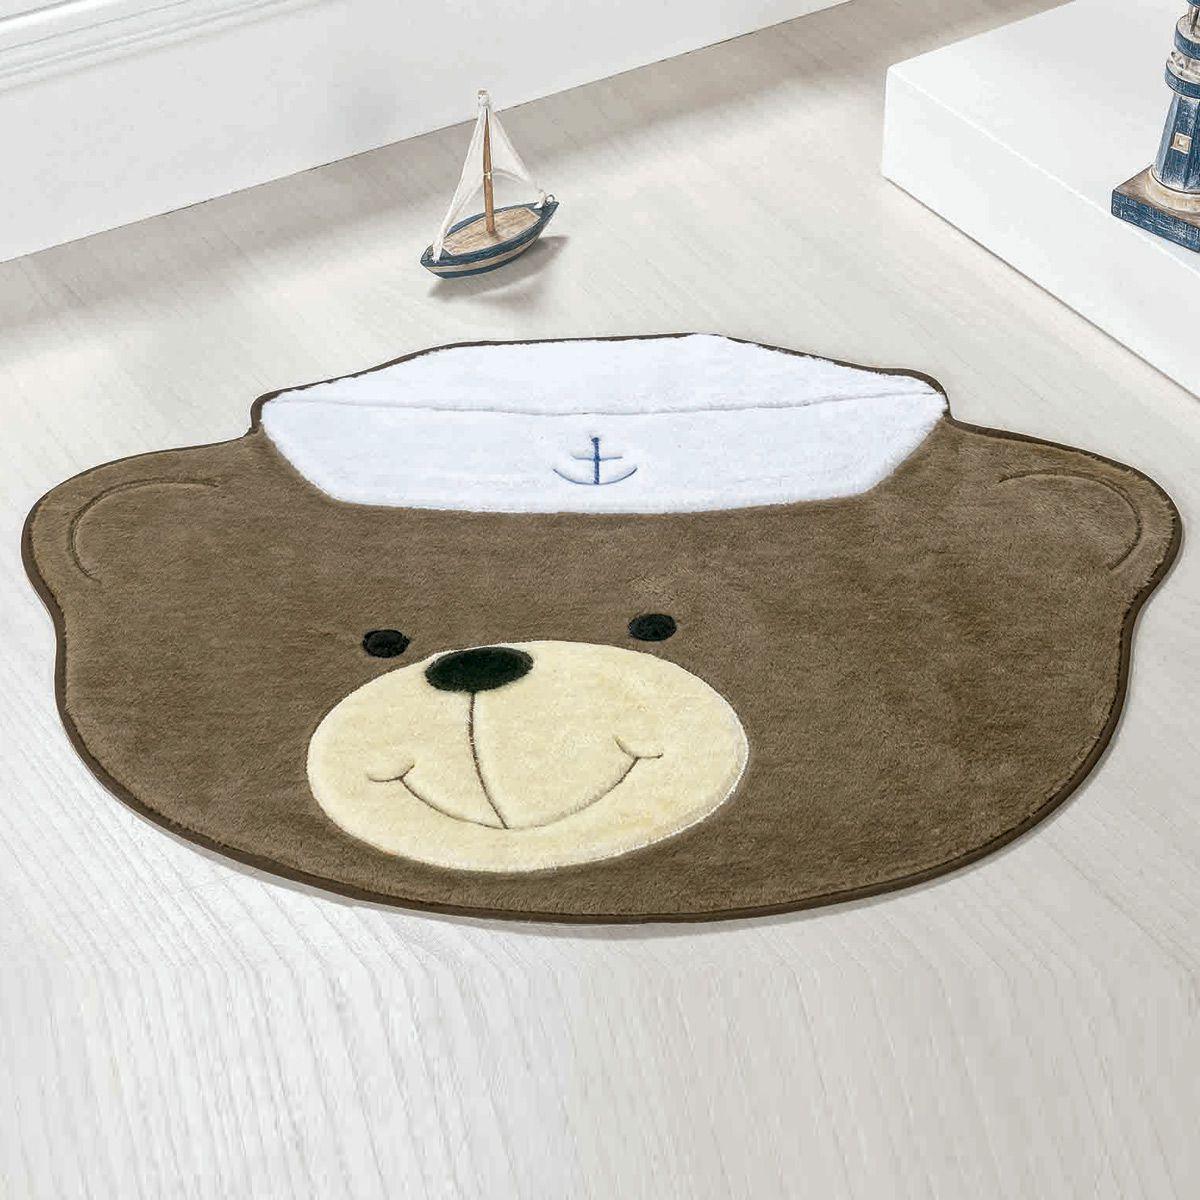 Tapete Big Infantil Premium Formato Urso Marinheiro Castor 1,10m x 0,88m